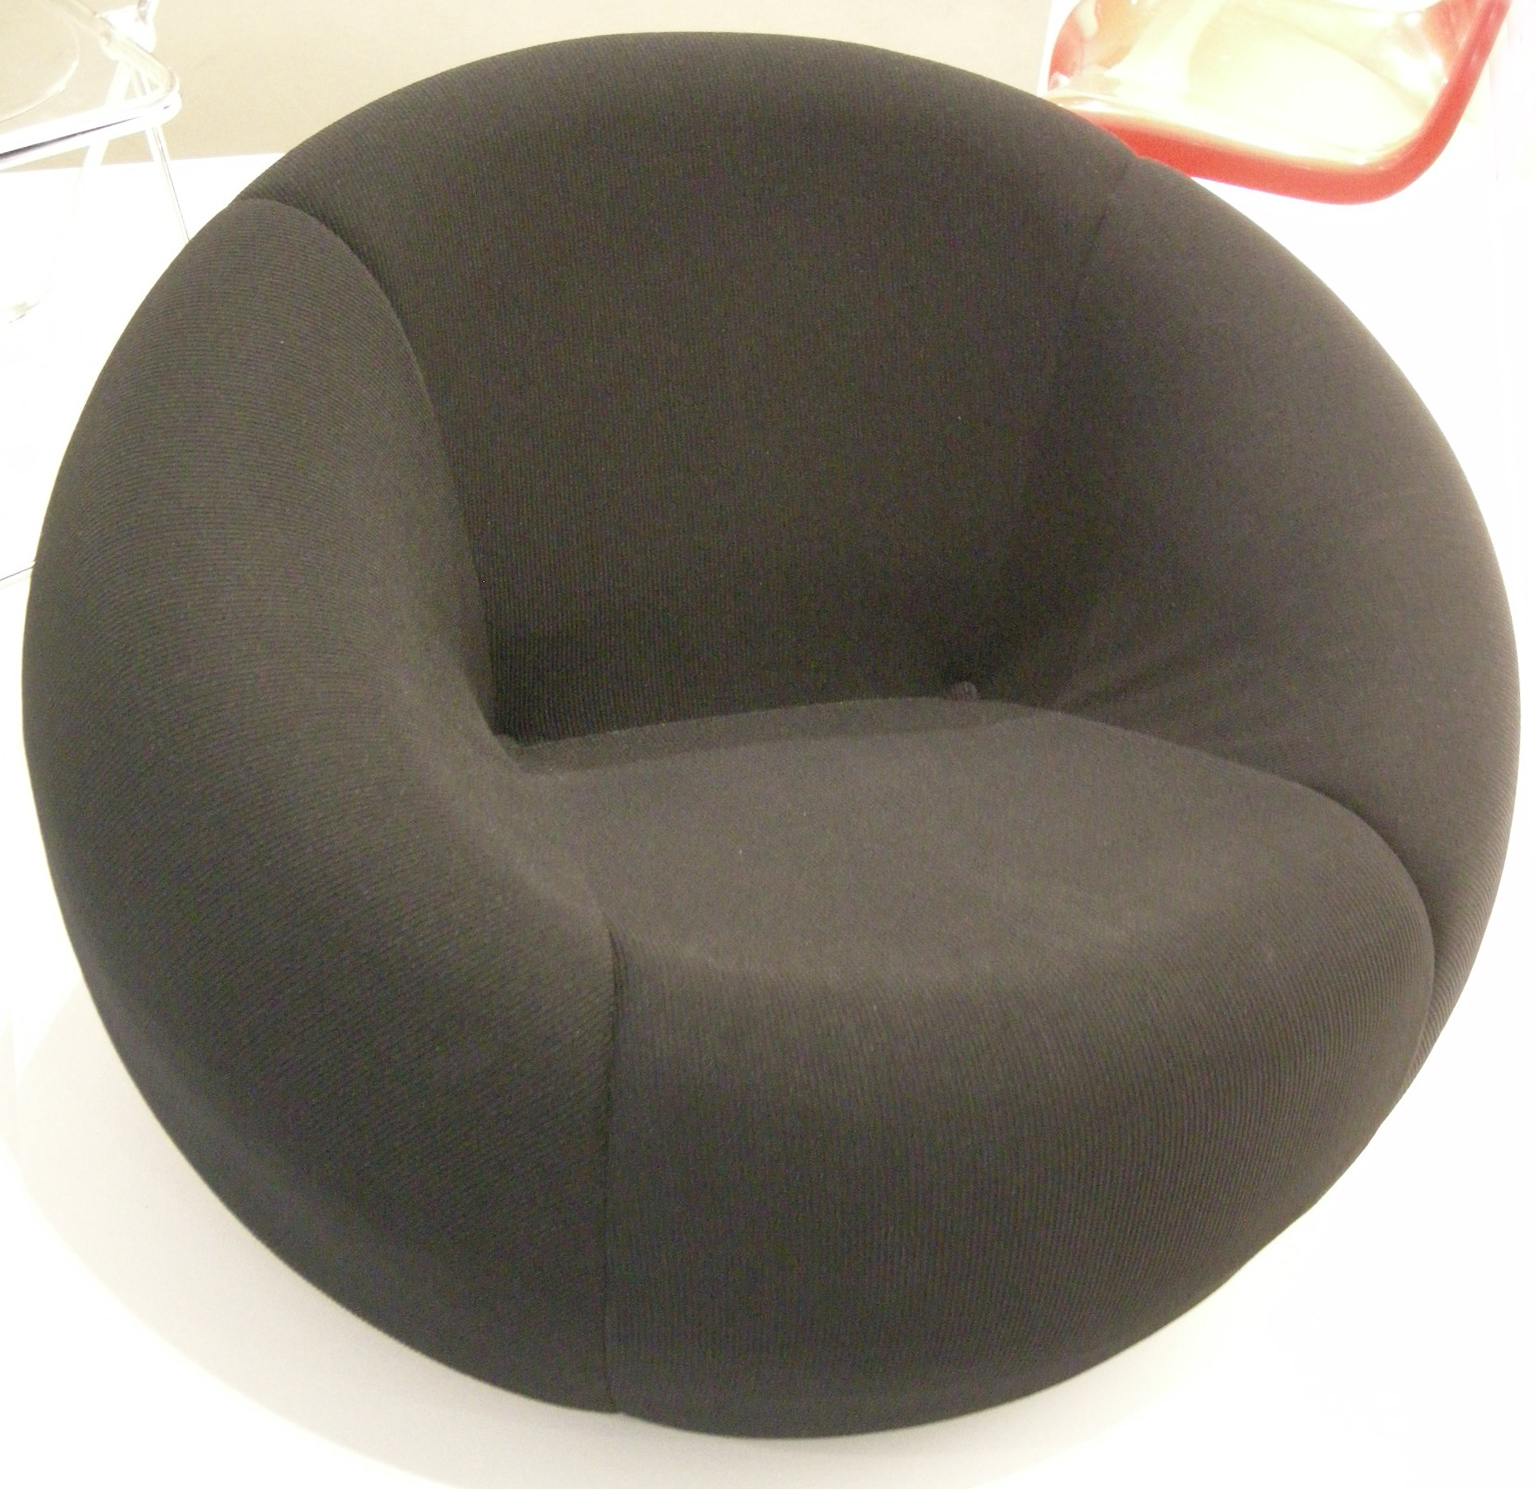 FileNgv design gaetano pesce up chair 1969.JPG & File:Ngv design gaetano pesce up chair 1969.JPG - Wikimedia Commons